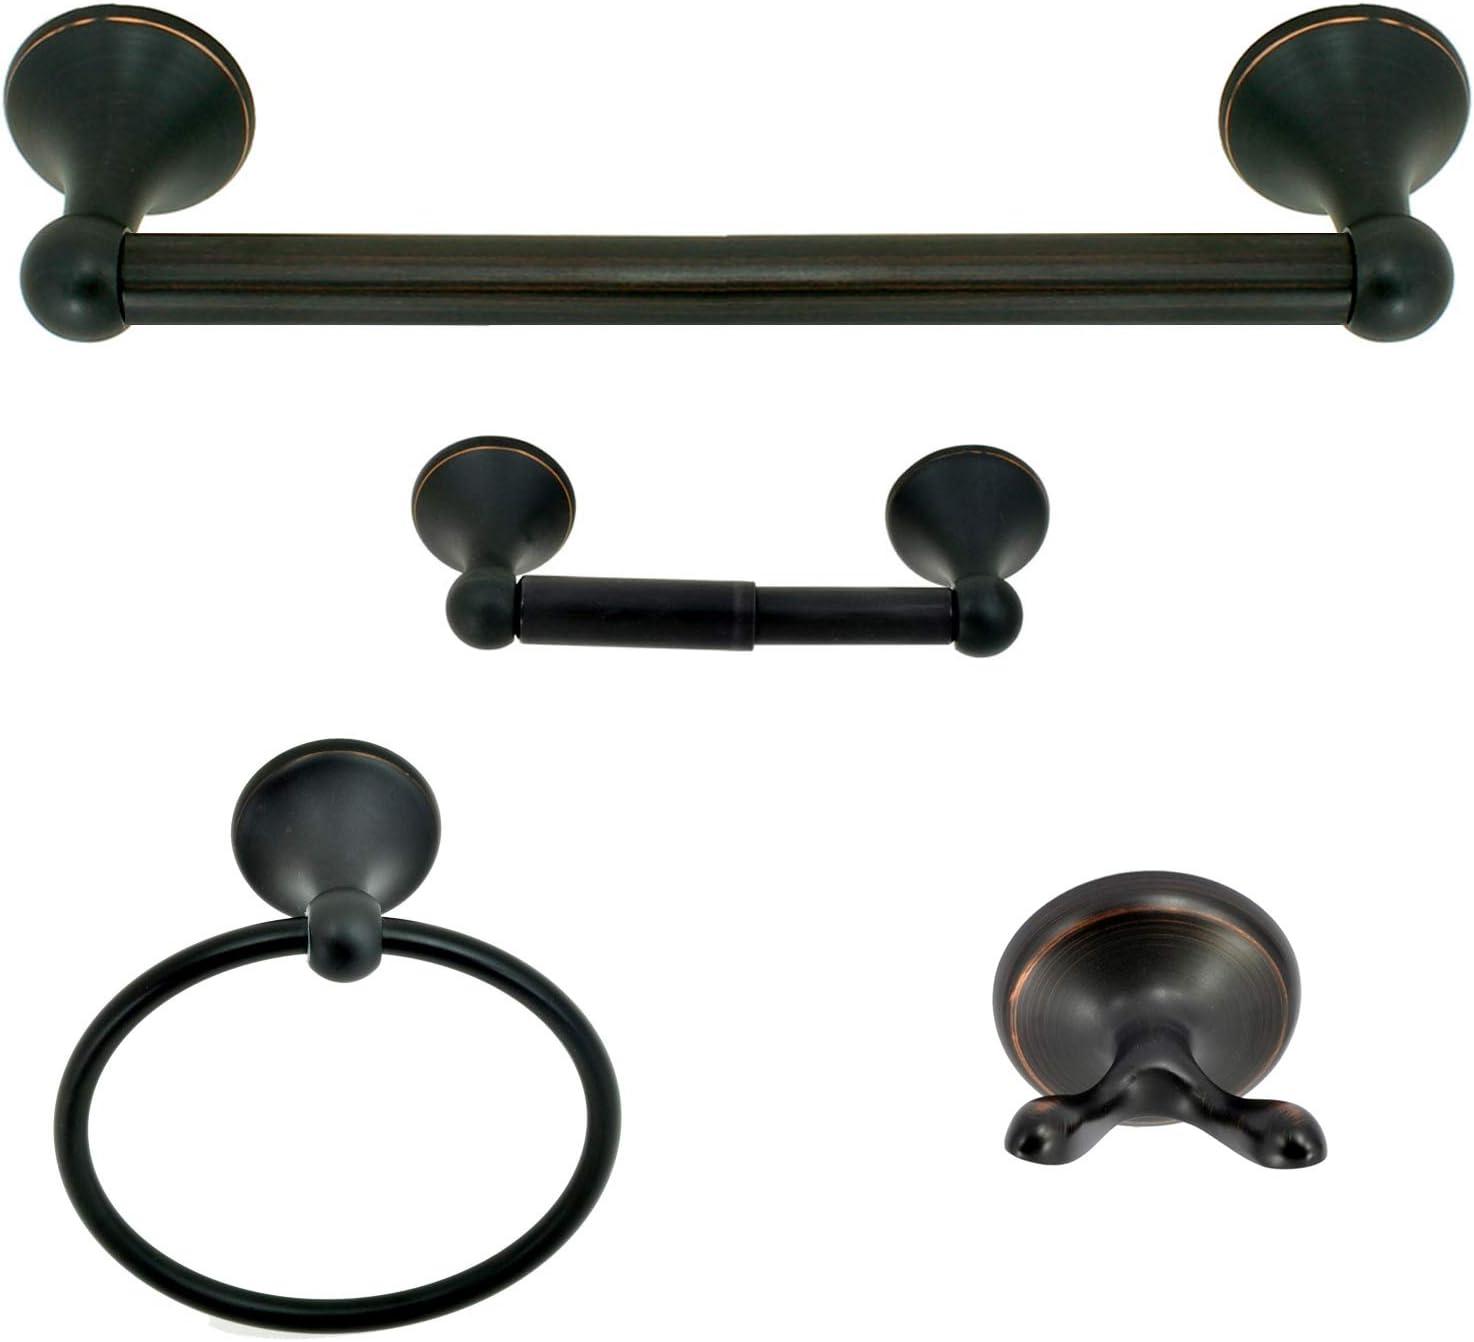 Nuk3y Modern 4 Piece Bathroom Hardware Towel Bar Accessory Set (Dark Bronze)